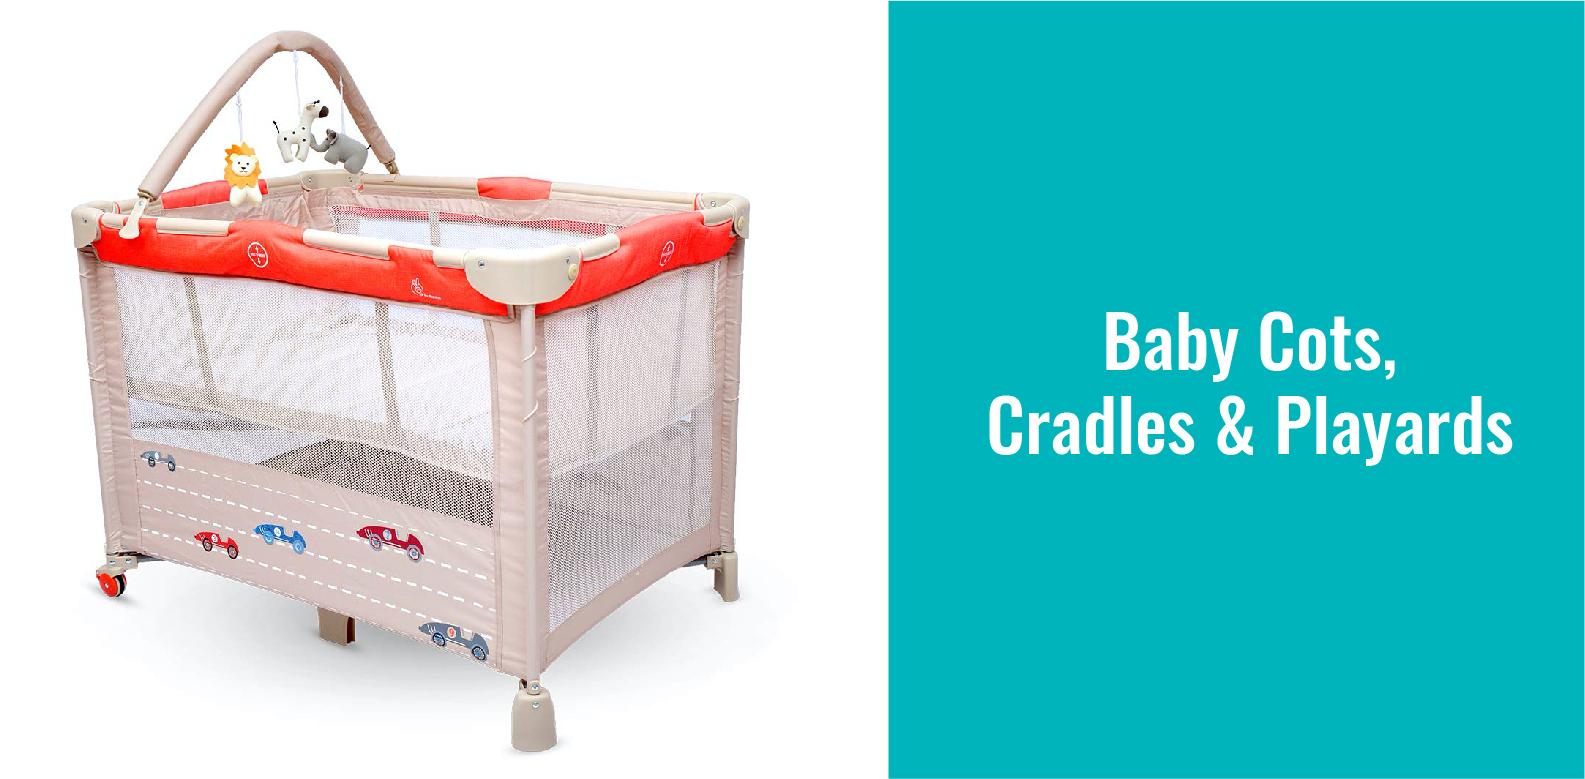 Baby Cots, Cradles & Playards